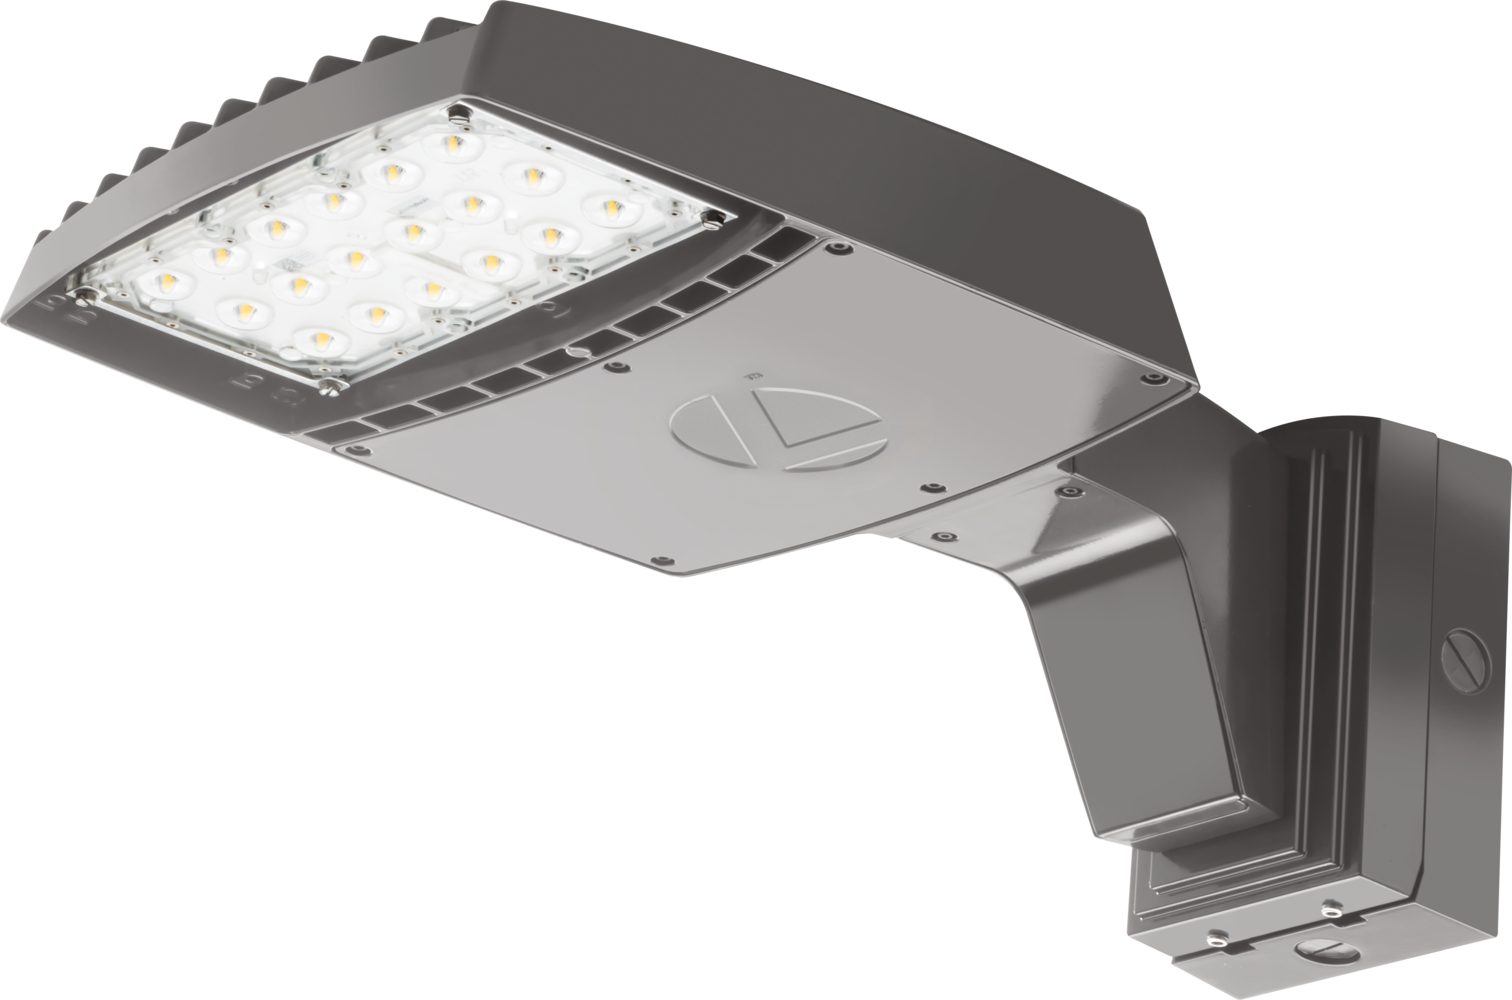 RSX1 LED WBASC DDBXD_002.jpeg